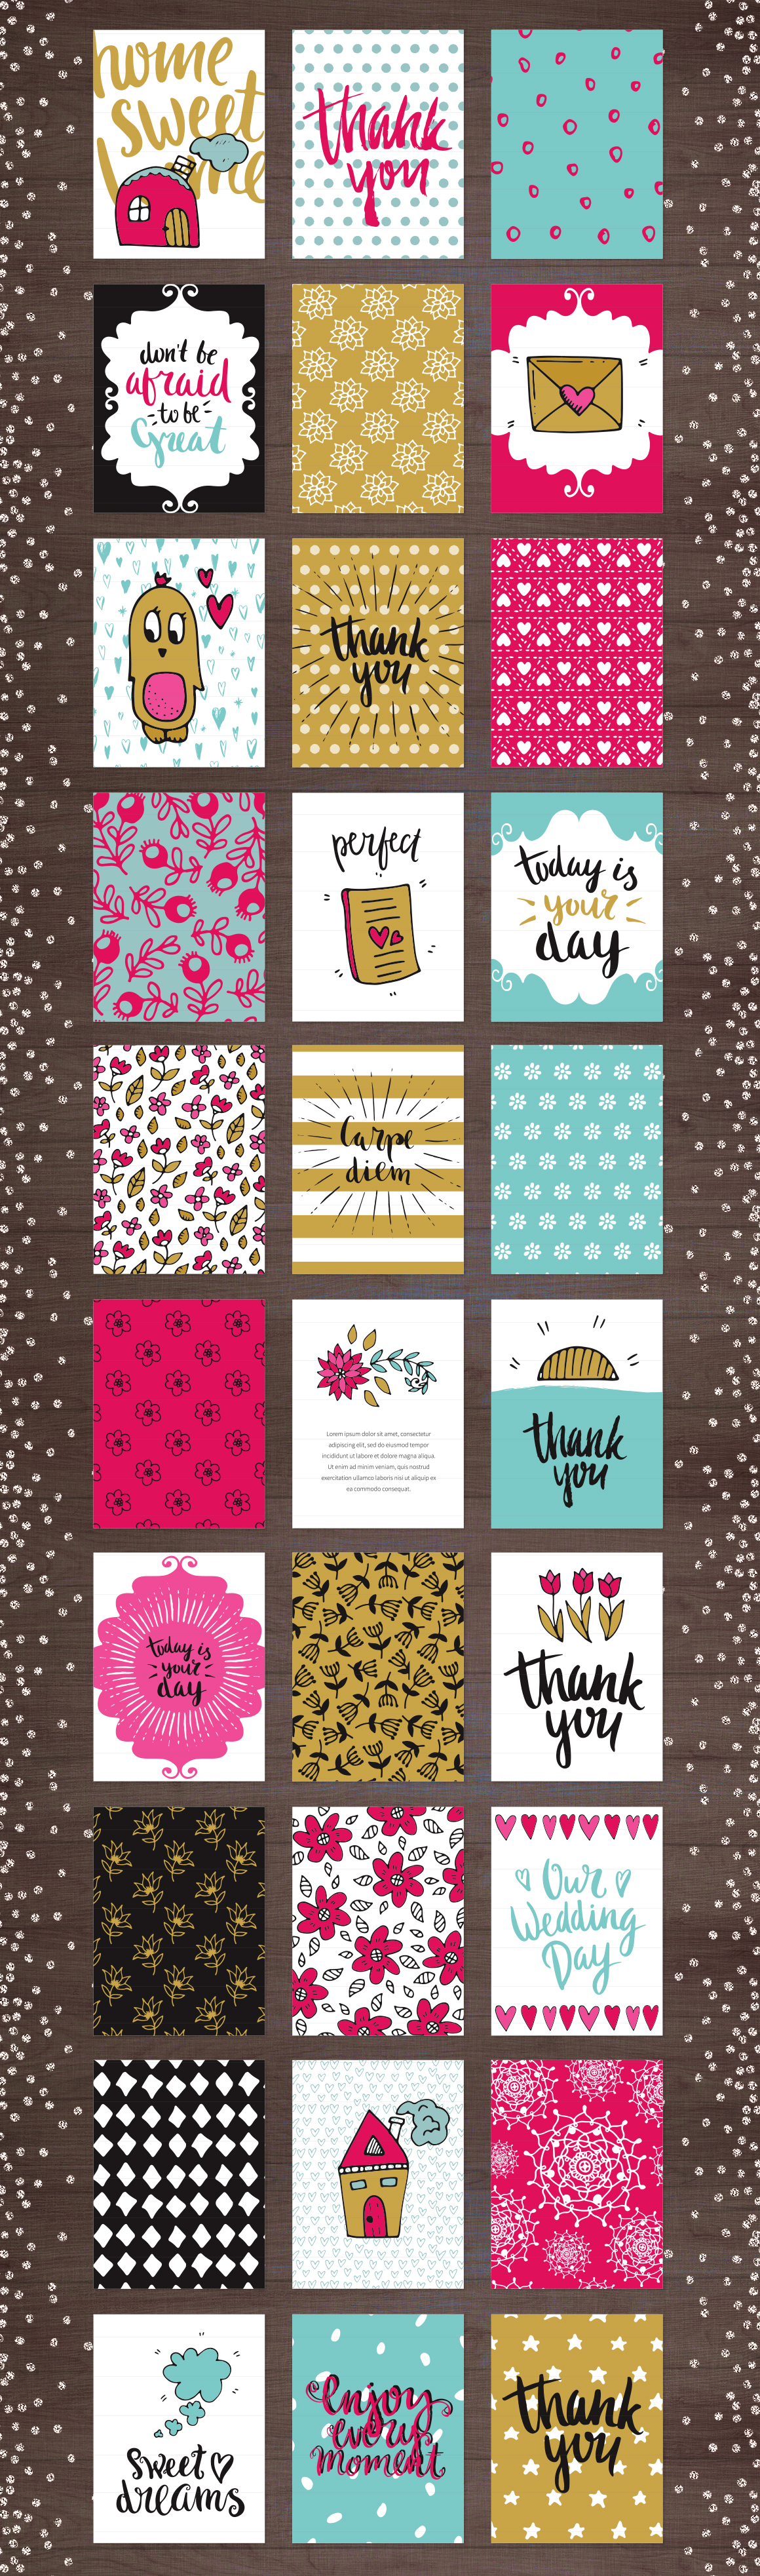 60 Valentine's Day Romantic Cards #3 example image 3